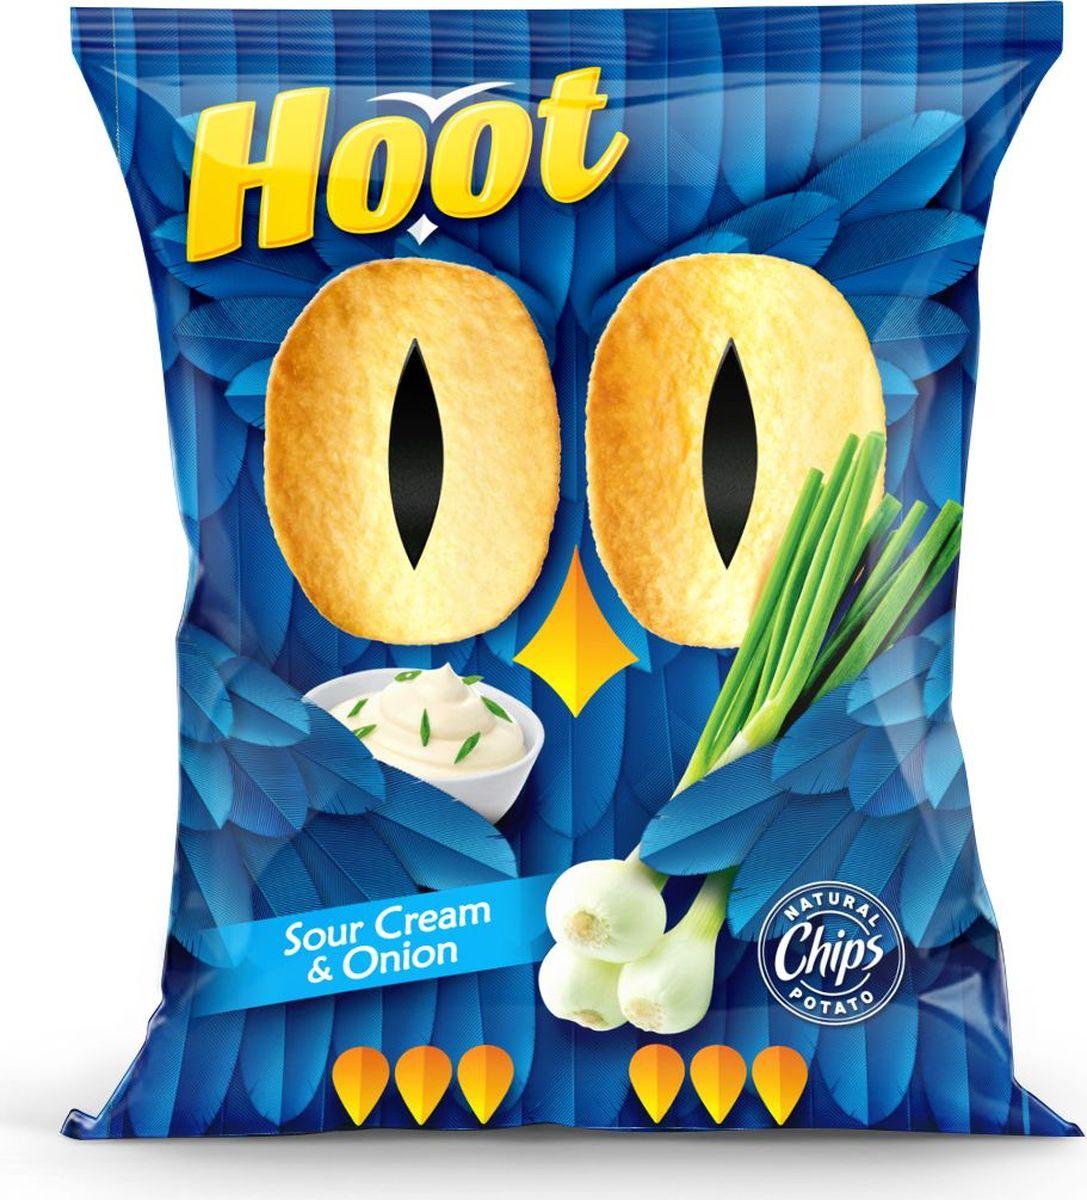 Hoot Чипсы, сметана-лук, 70 г конфэшн минутки вафли со вкусом сливок айриш крим 165 г